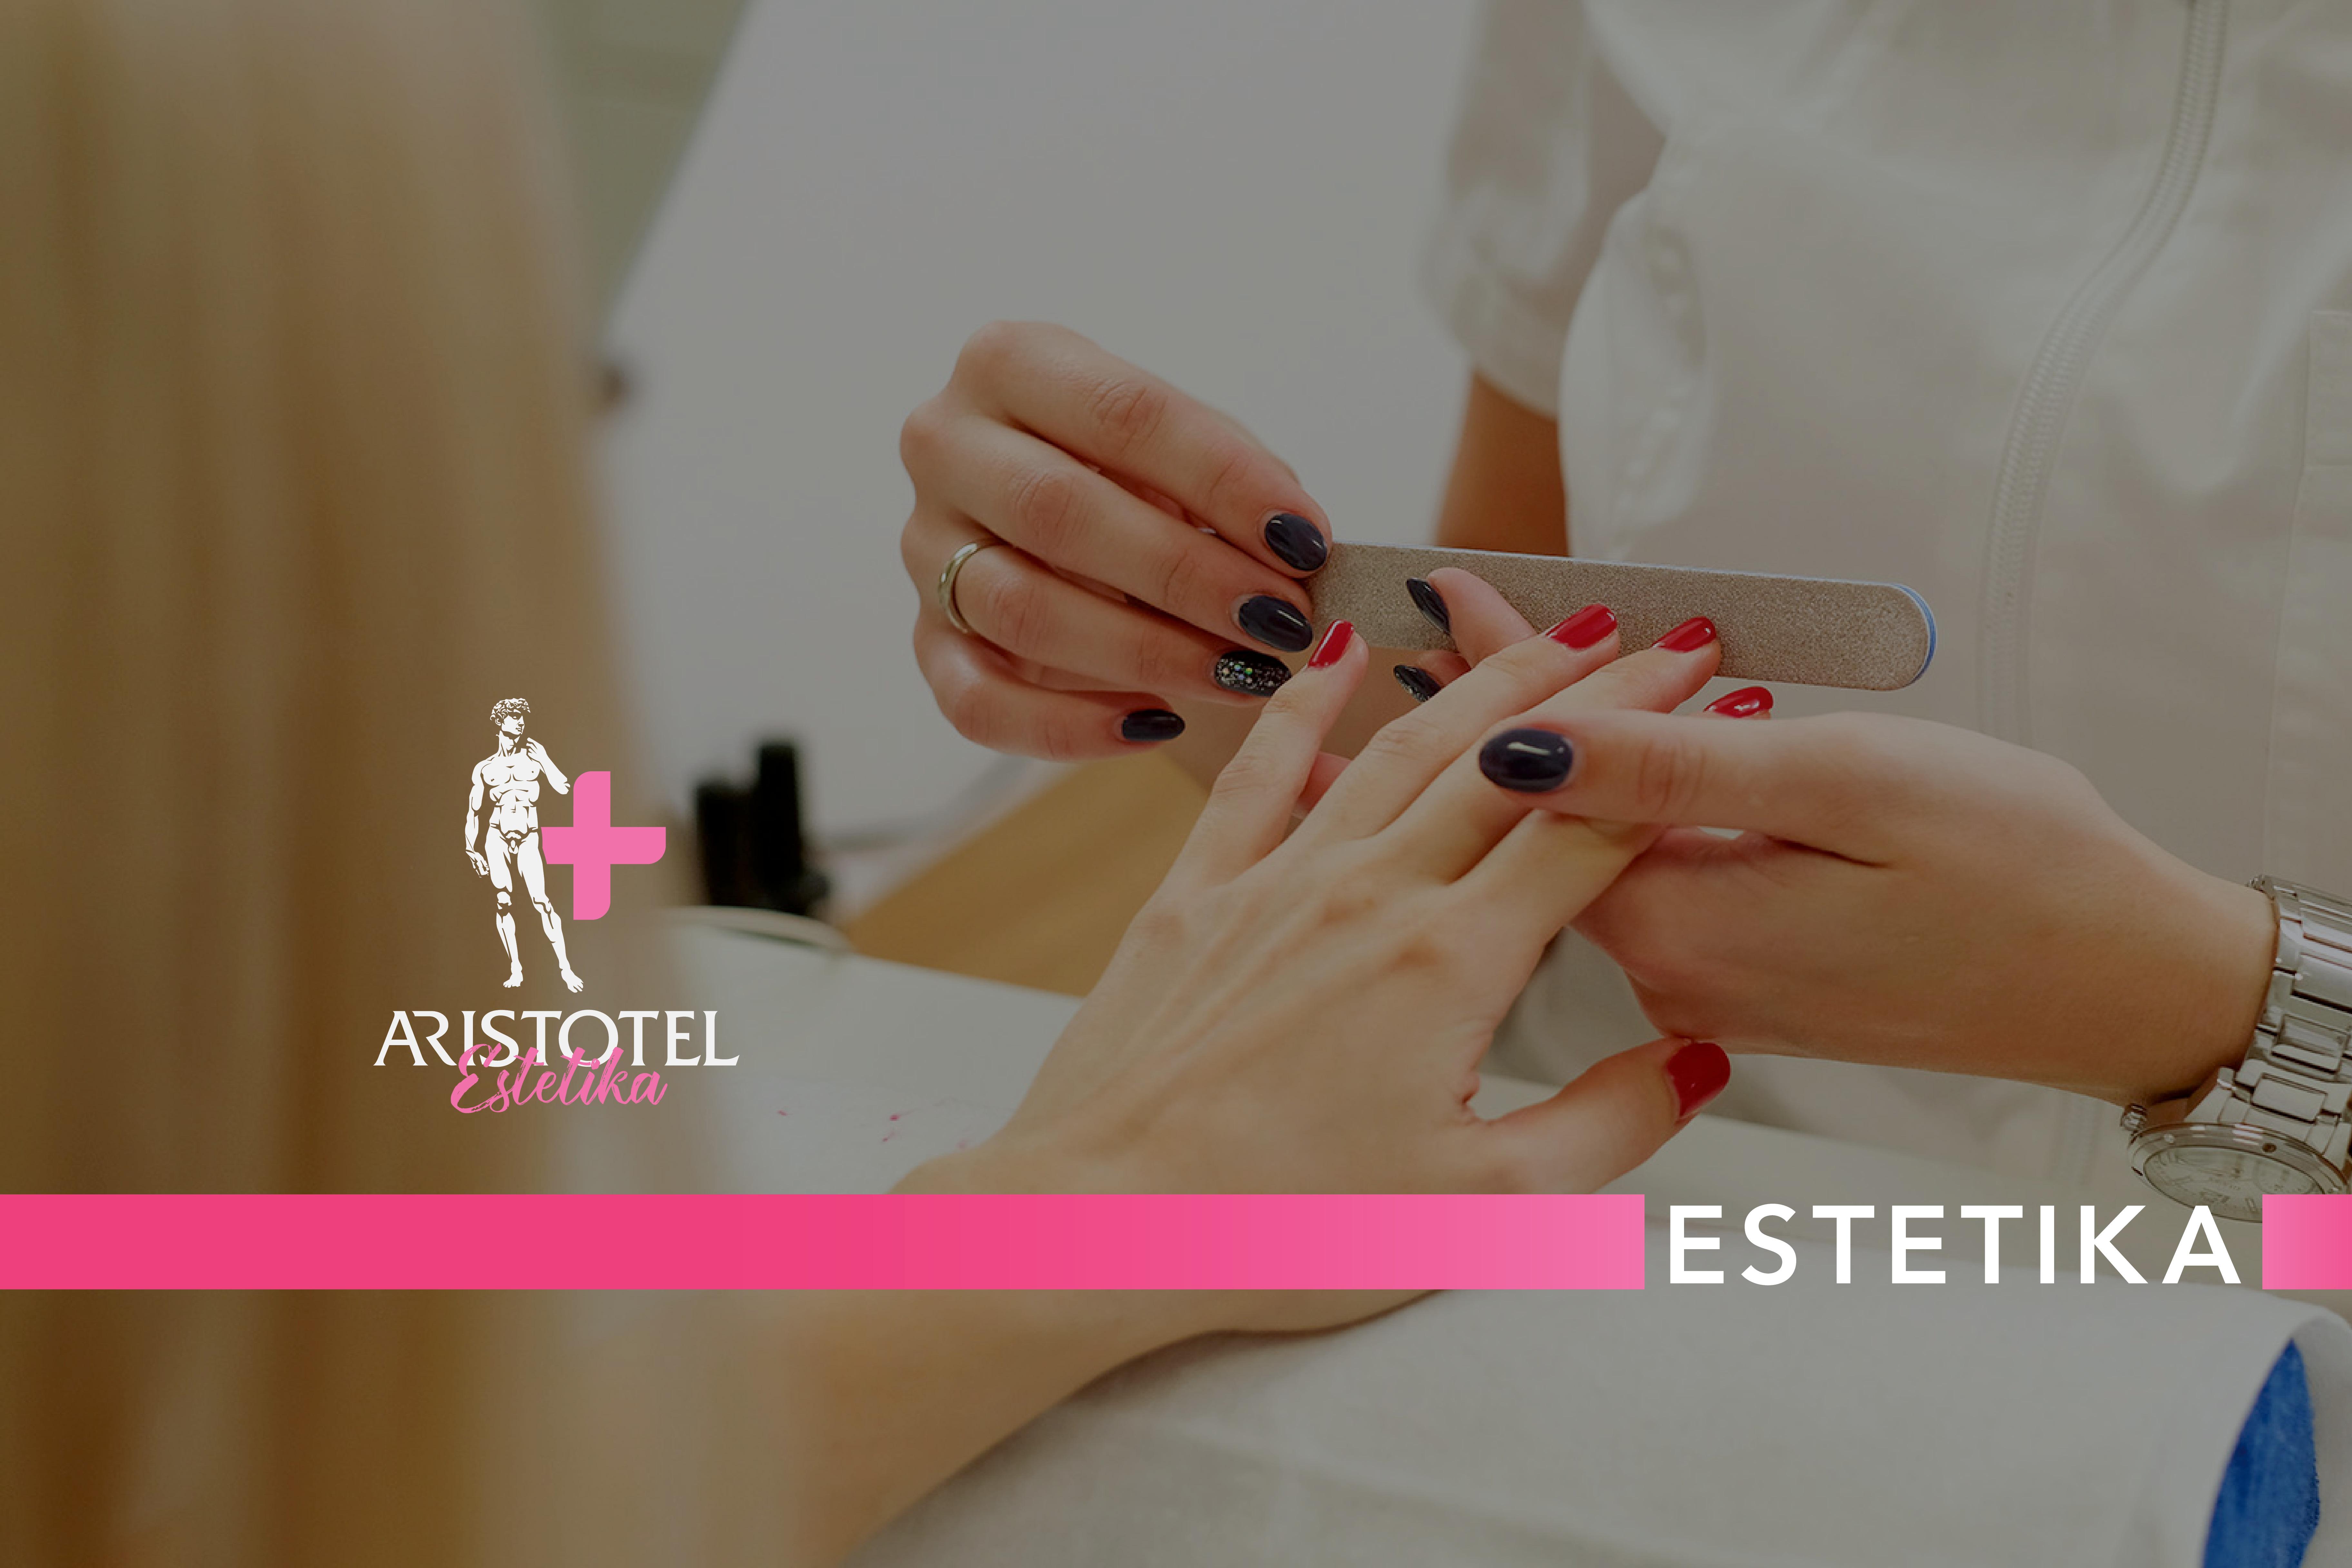 Estetika 01